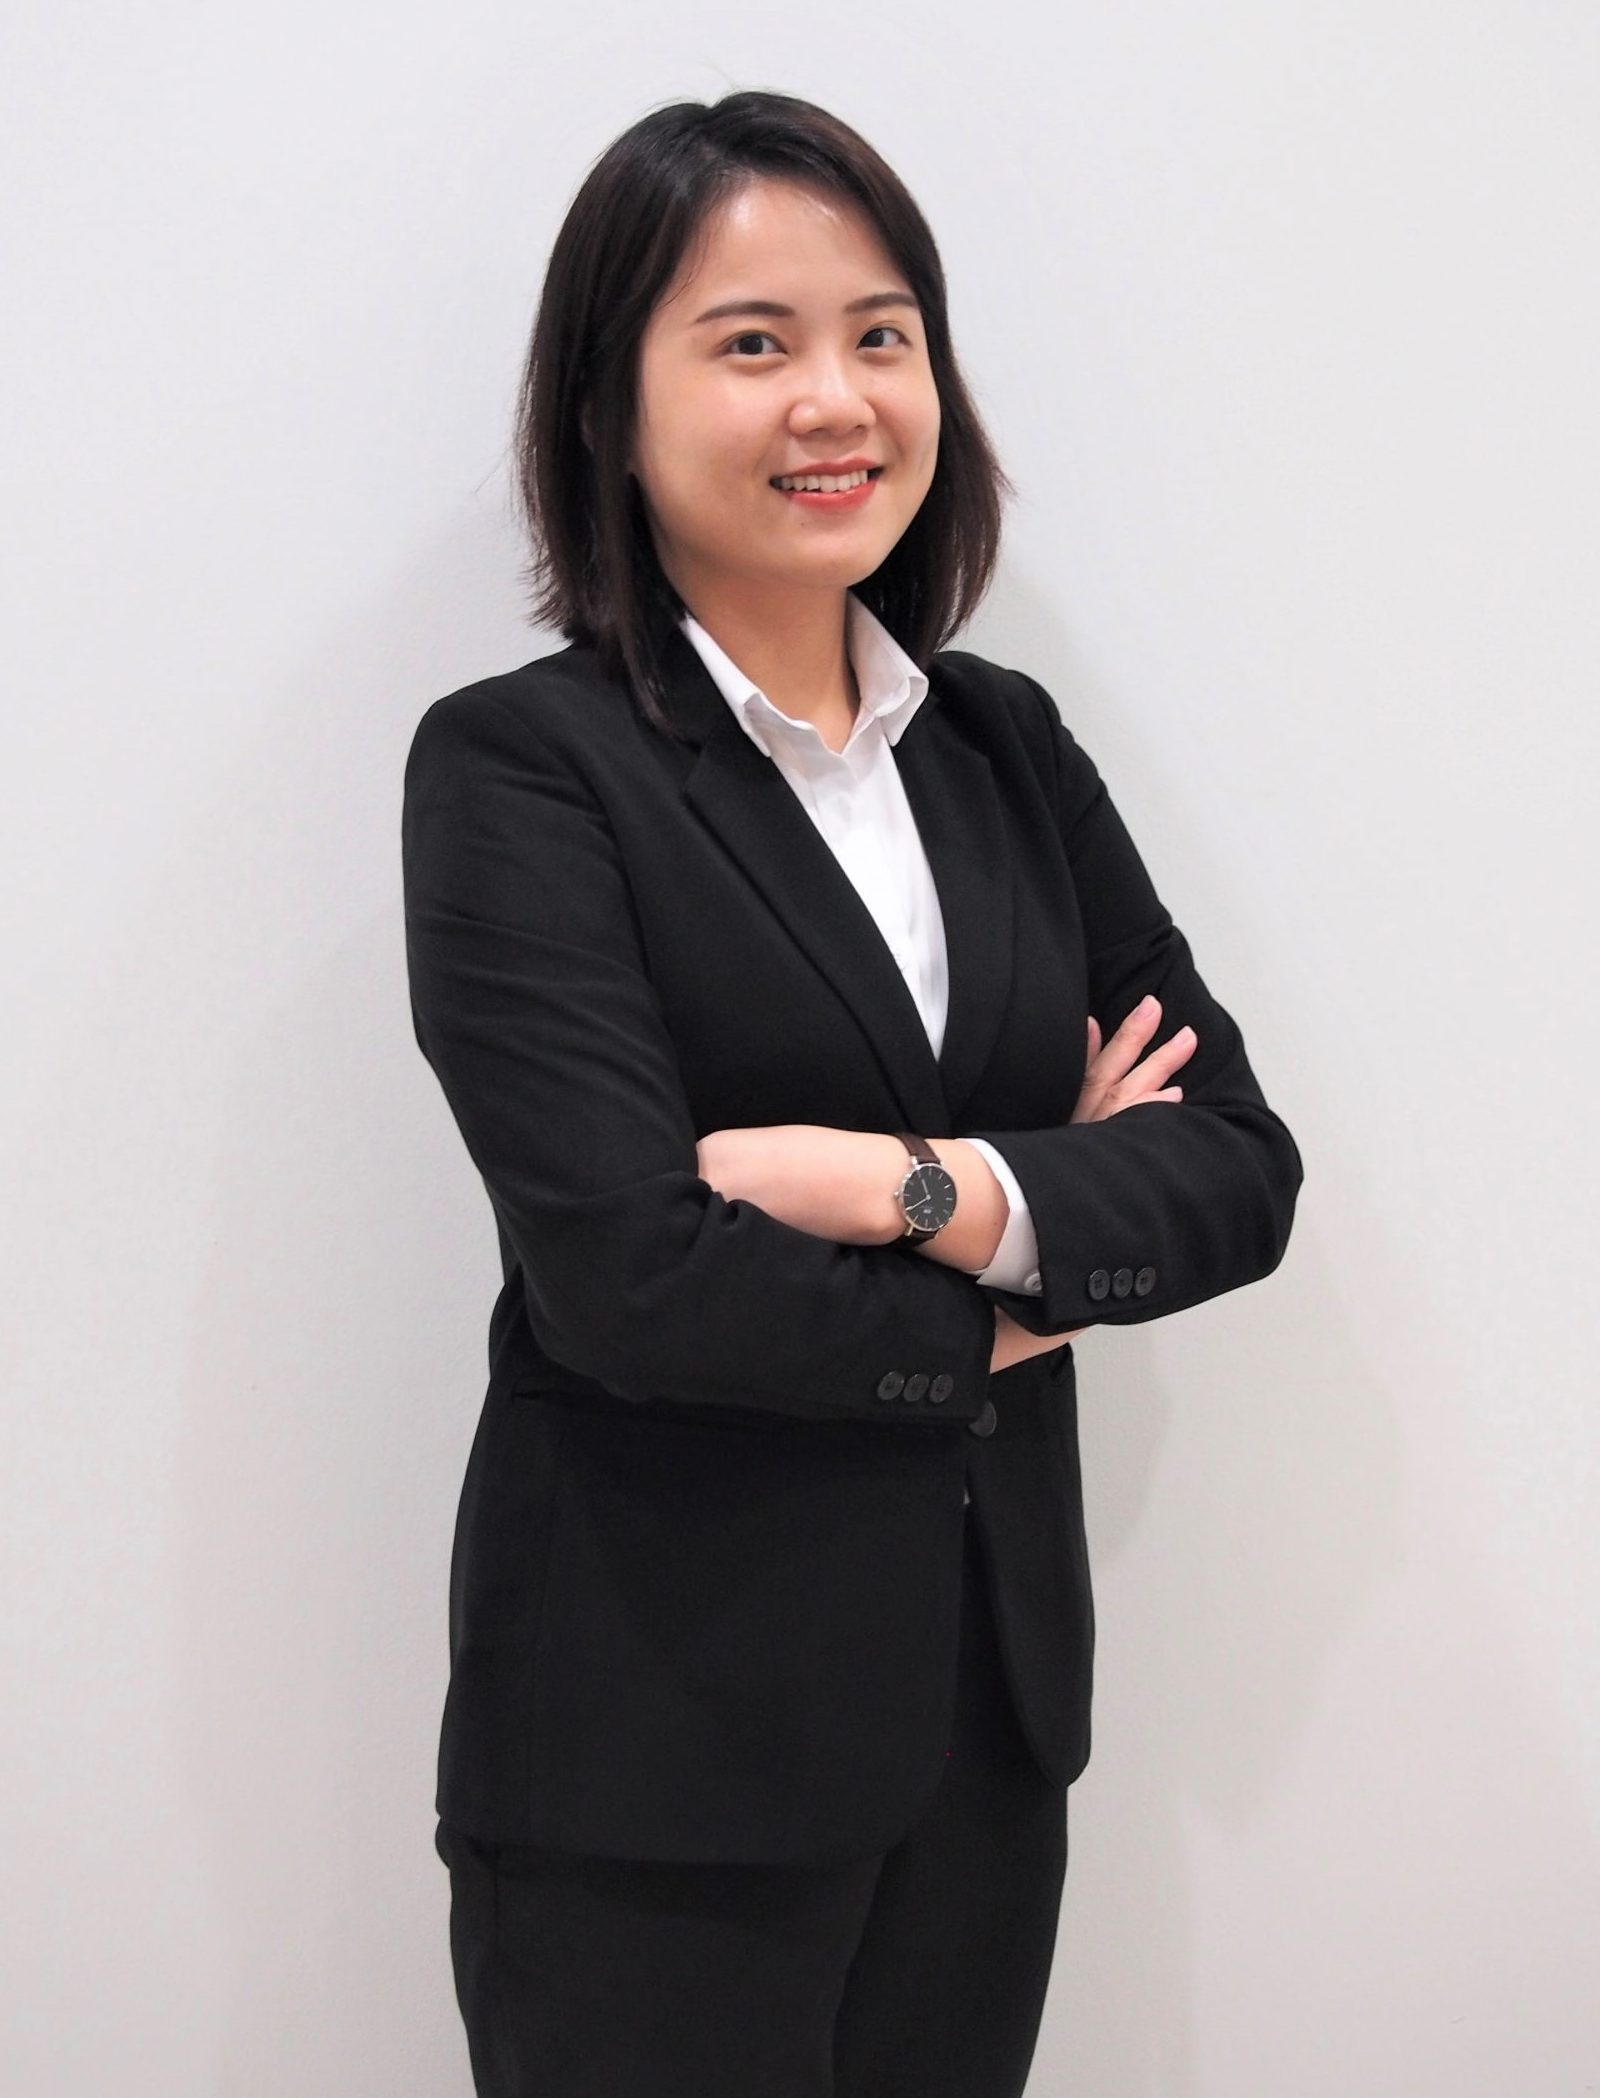 Lee Kha Xuan